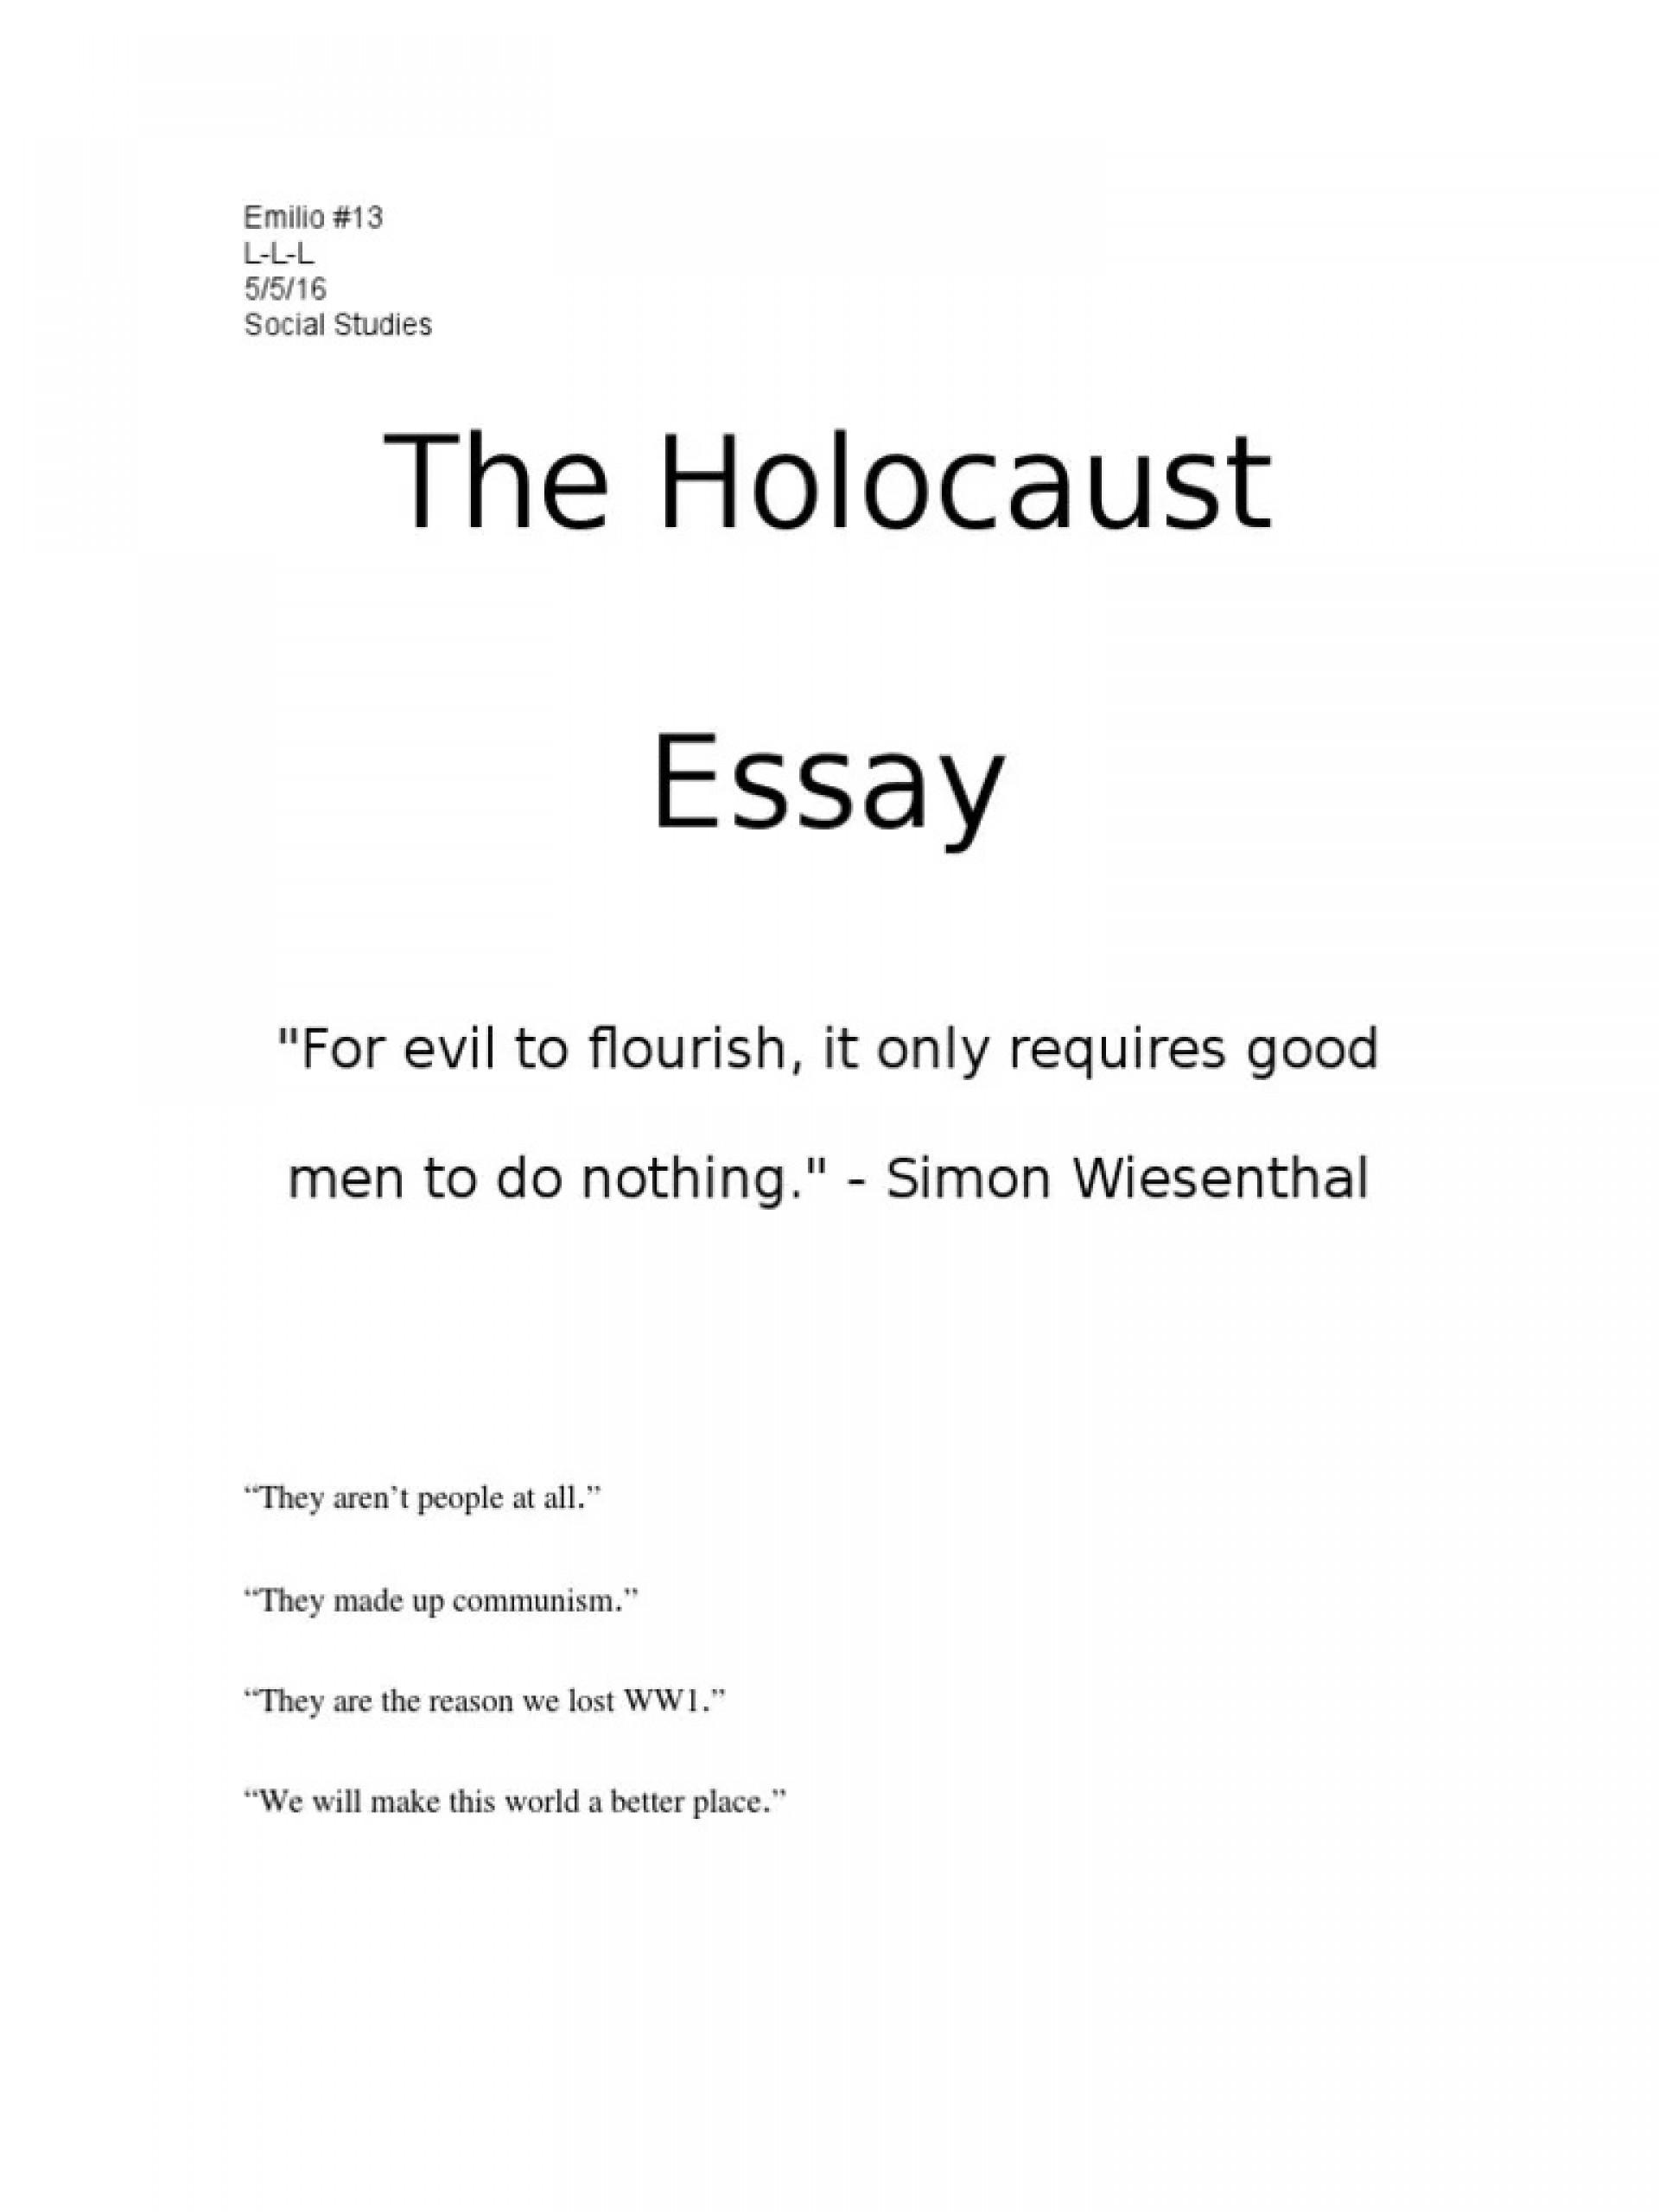 003 Singular Holocaust Essay Design  Thesi Hook Contest 20201920